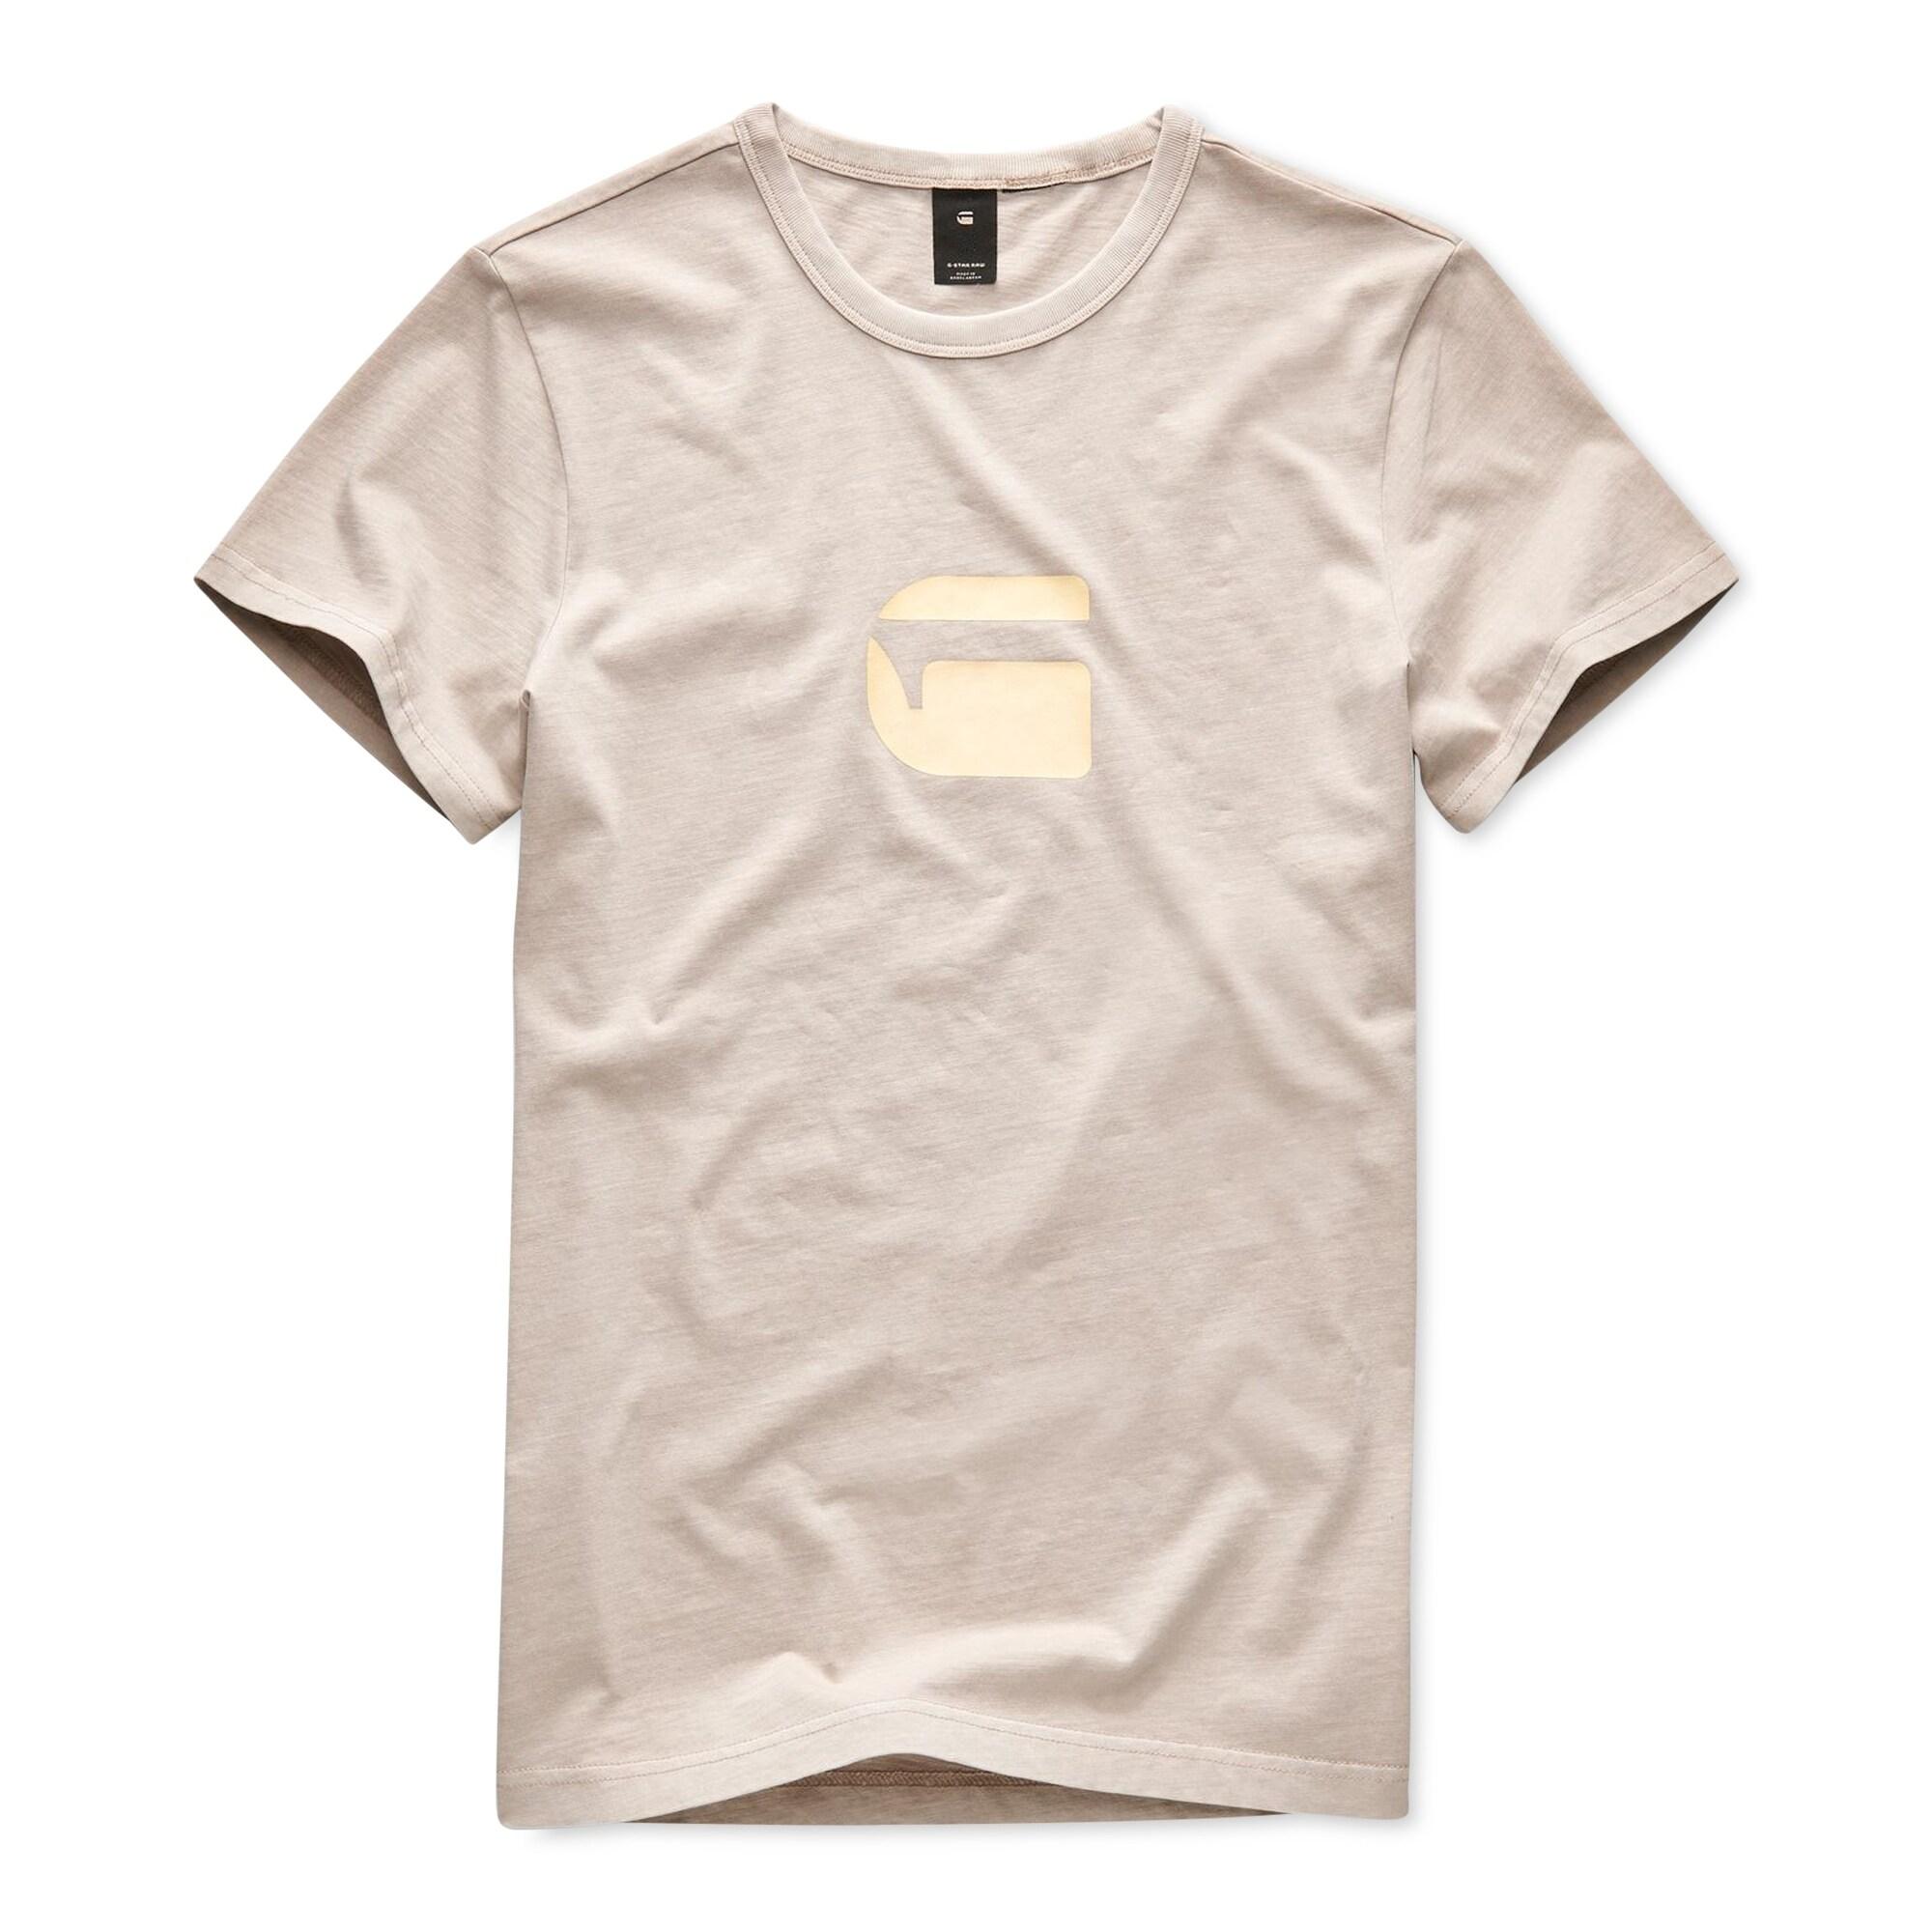 G STAR RAW Mens Beige Size Medium M Dedda Crewneck Graphic Tee T Shirt